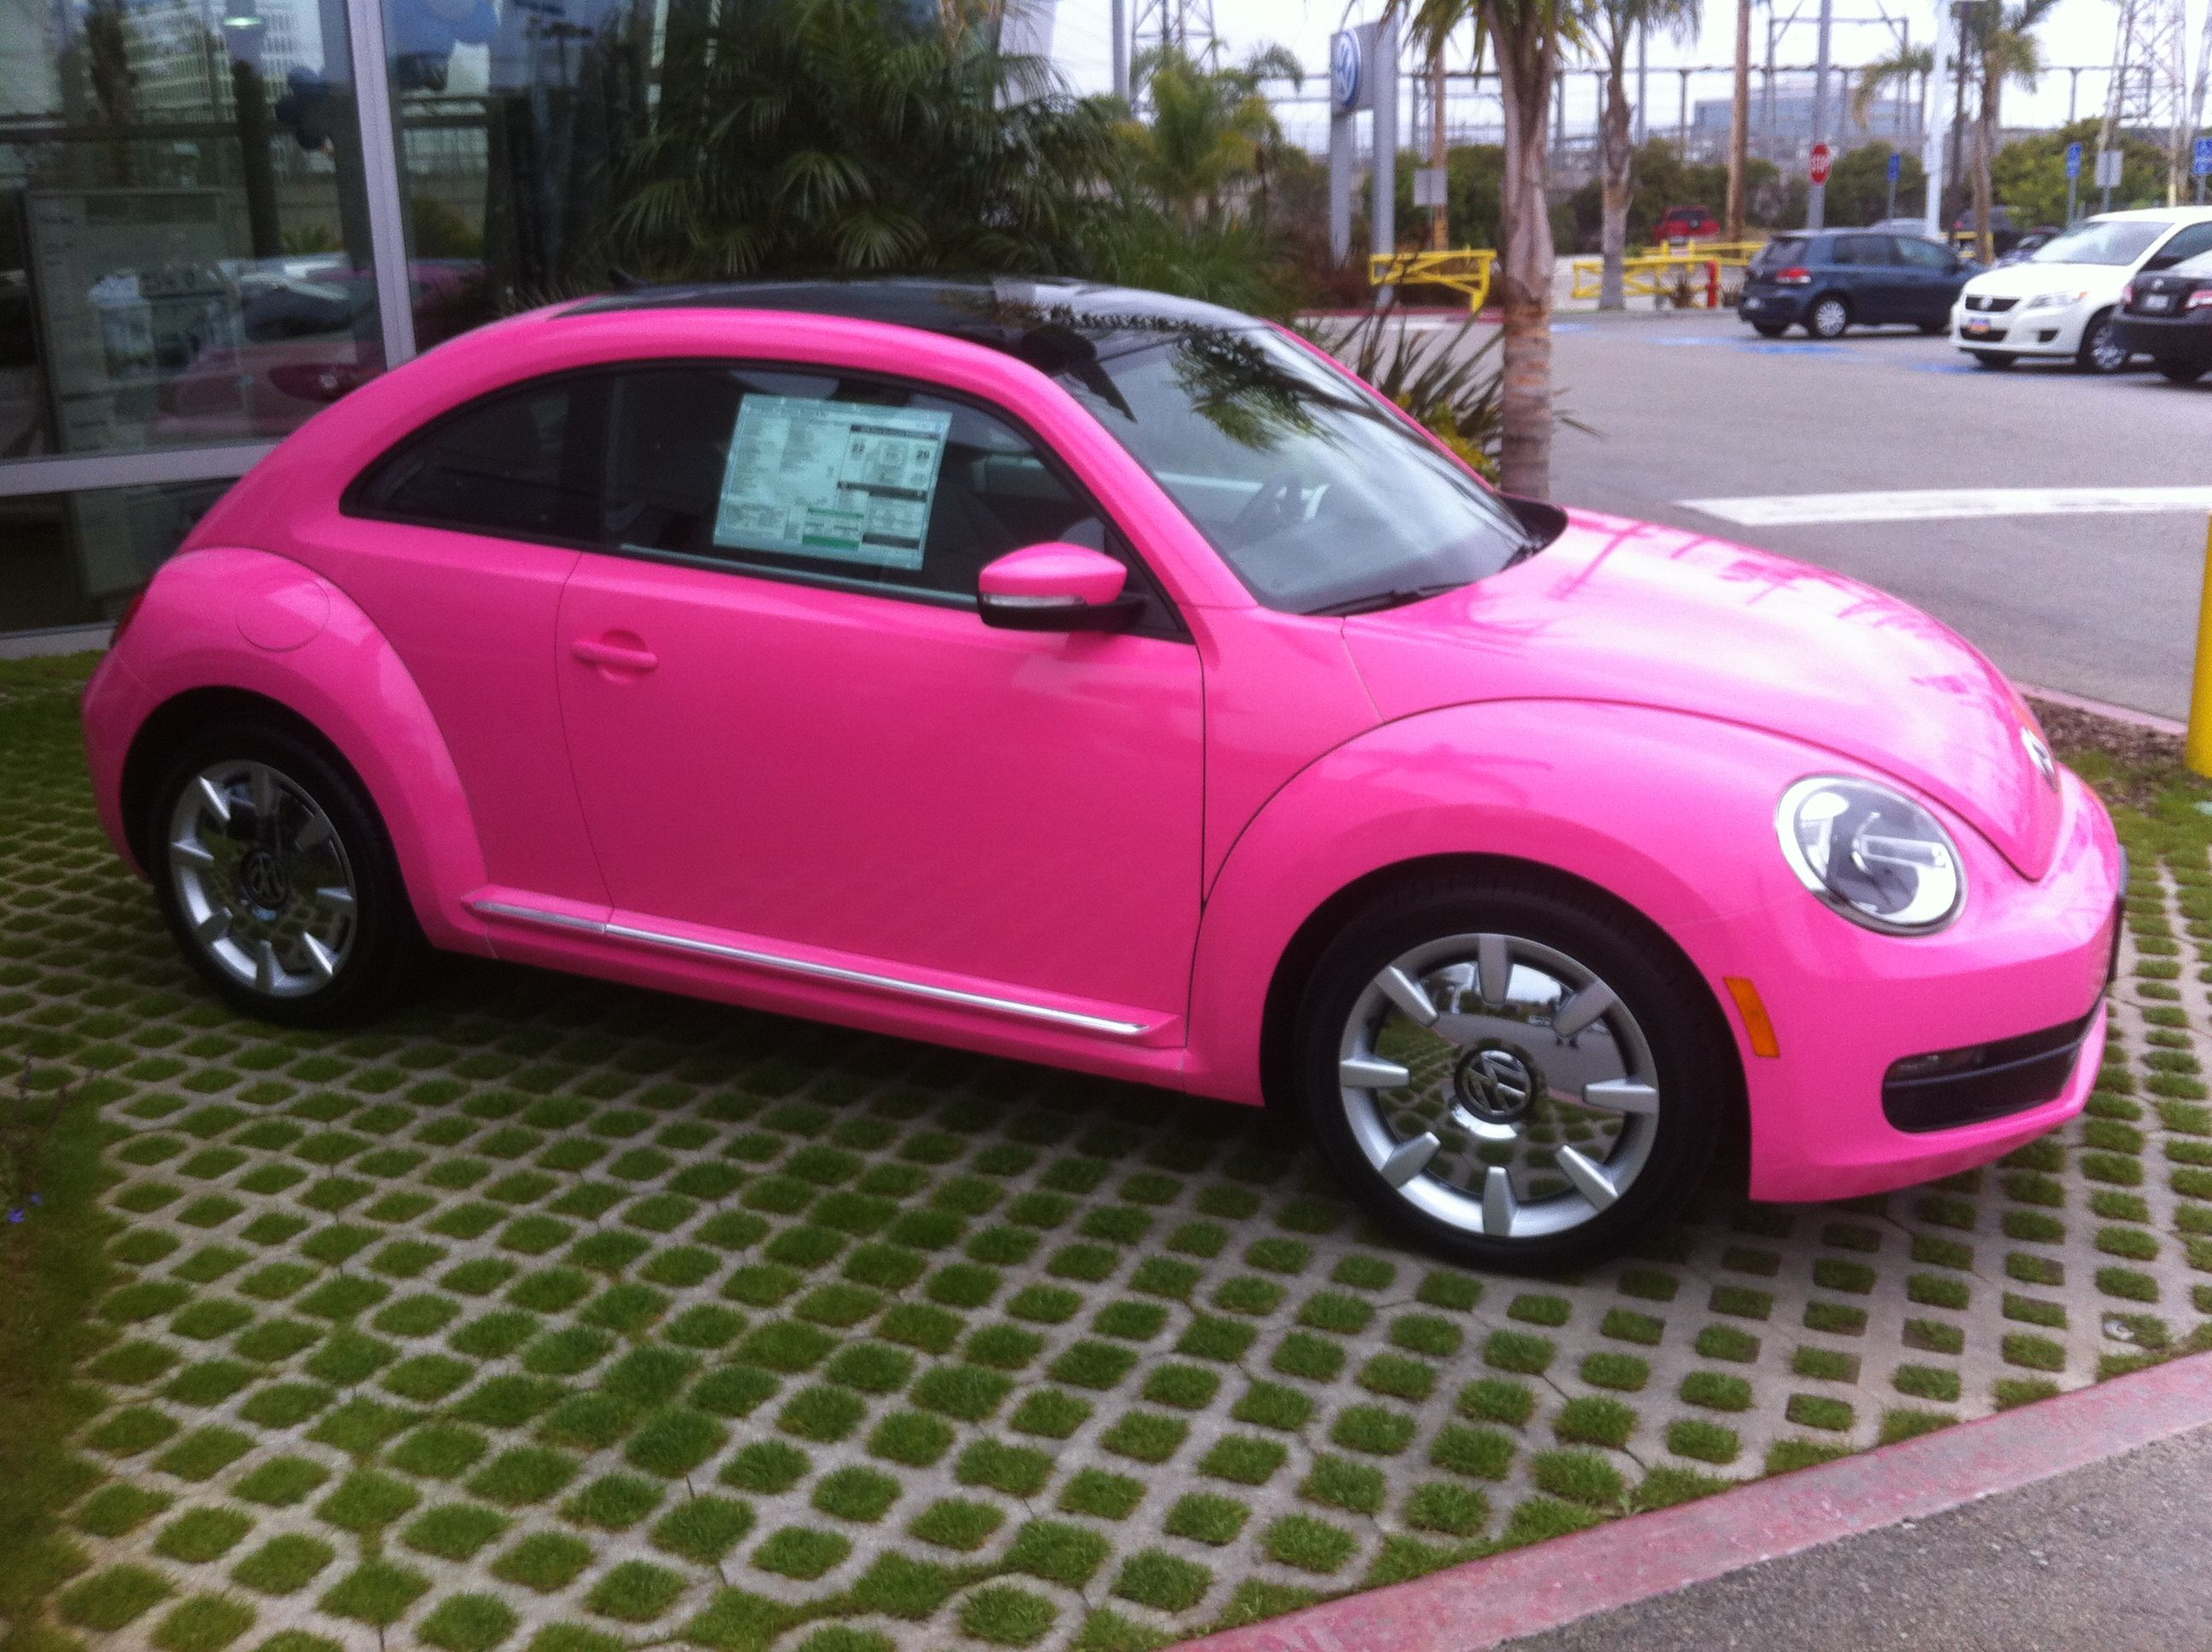 beetle car 2013 pink images galleries with a bite. Black Bedroom Furniture Sets. Home Design Ideas